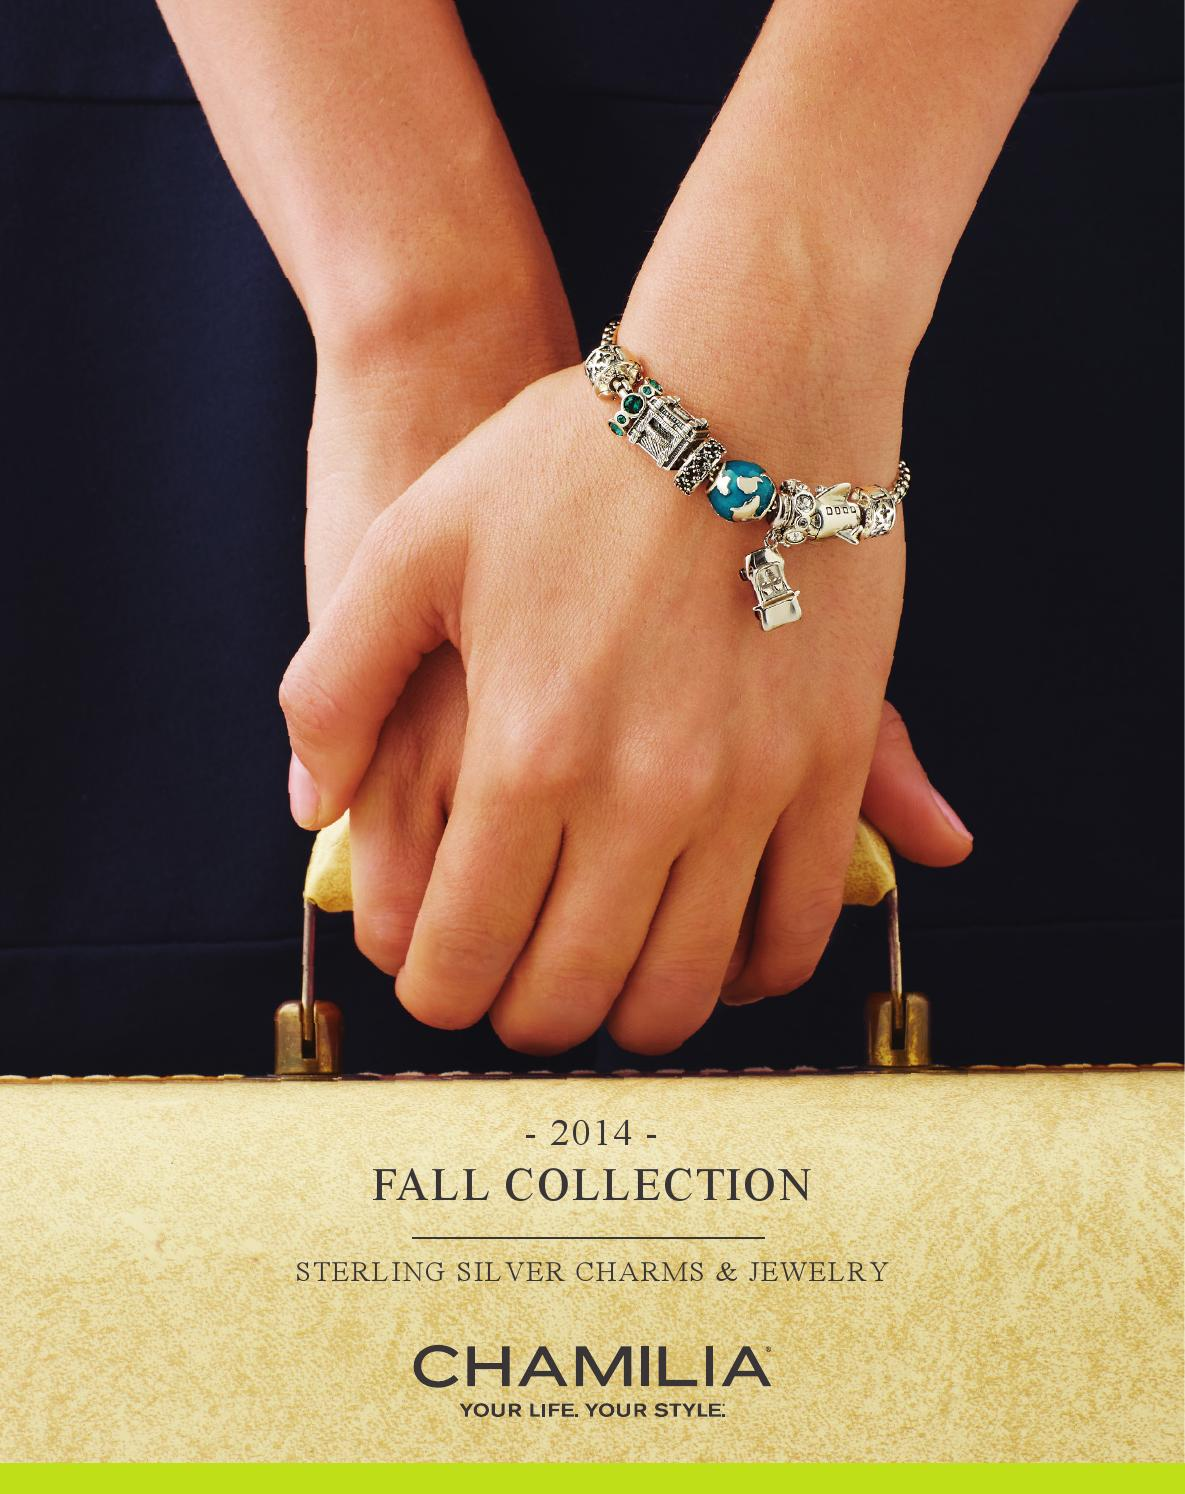 0101-Fall Colored Beads with Orange Bangle Bracelet